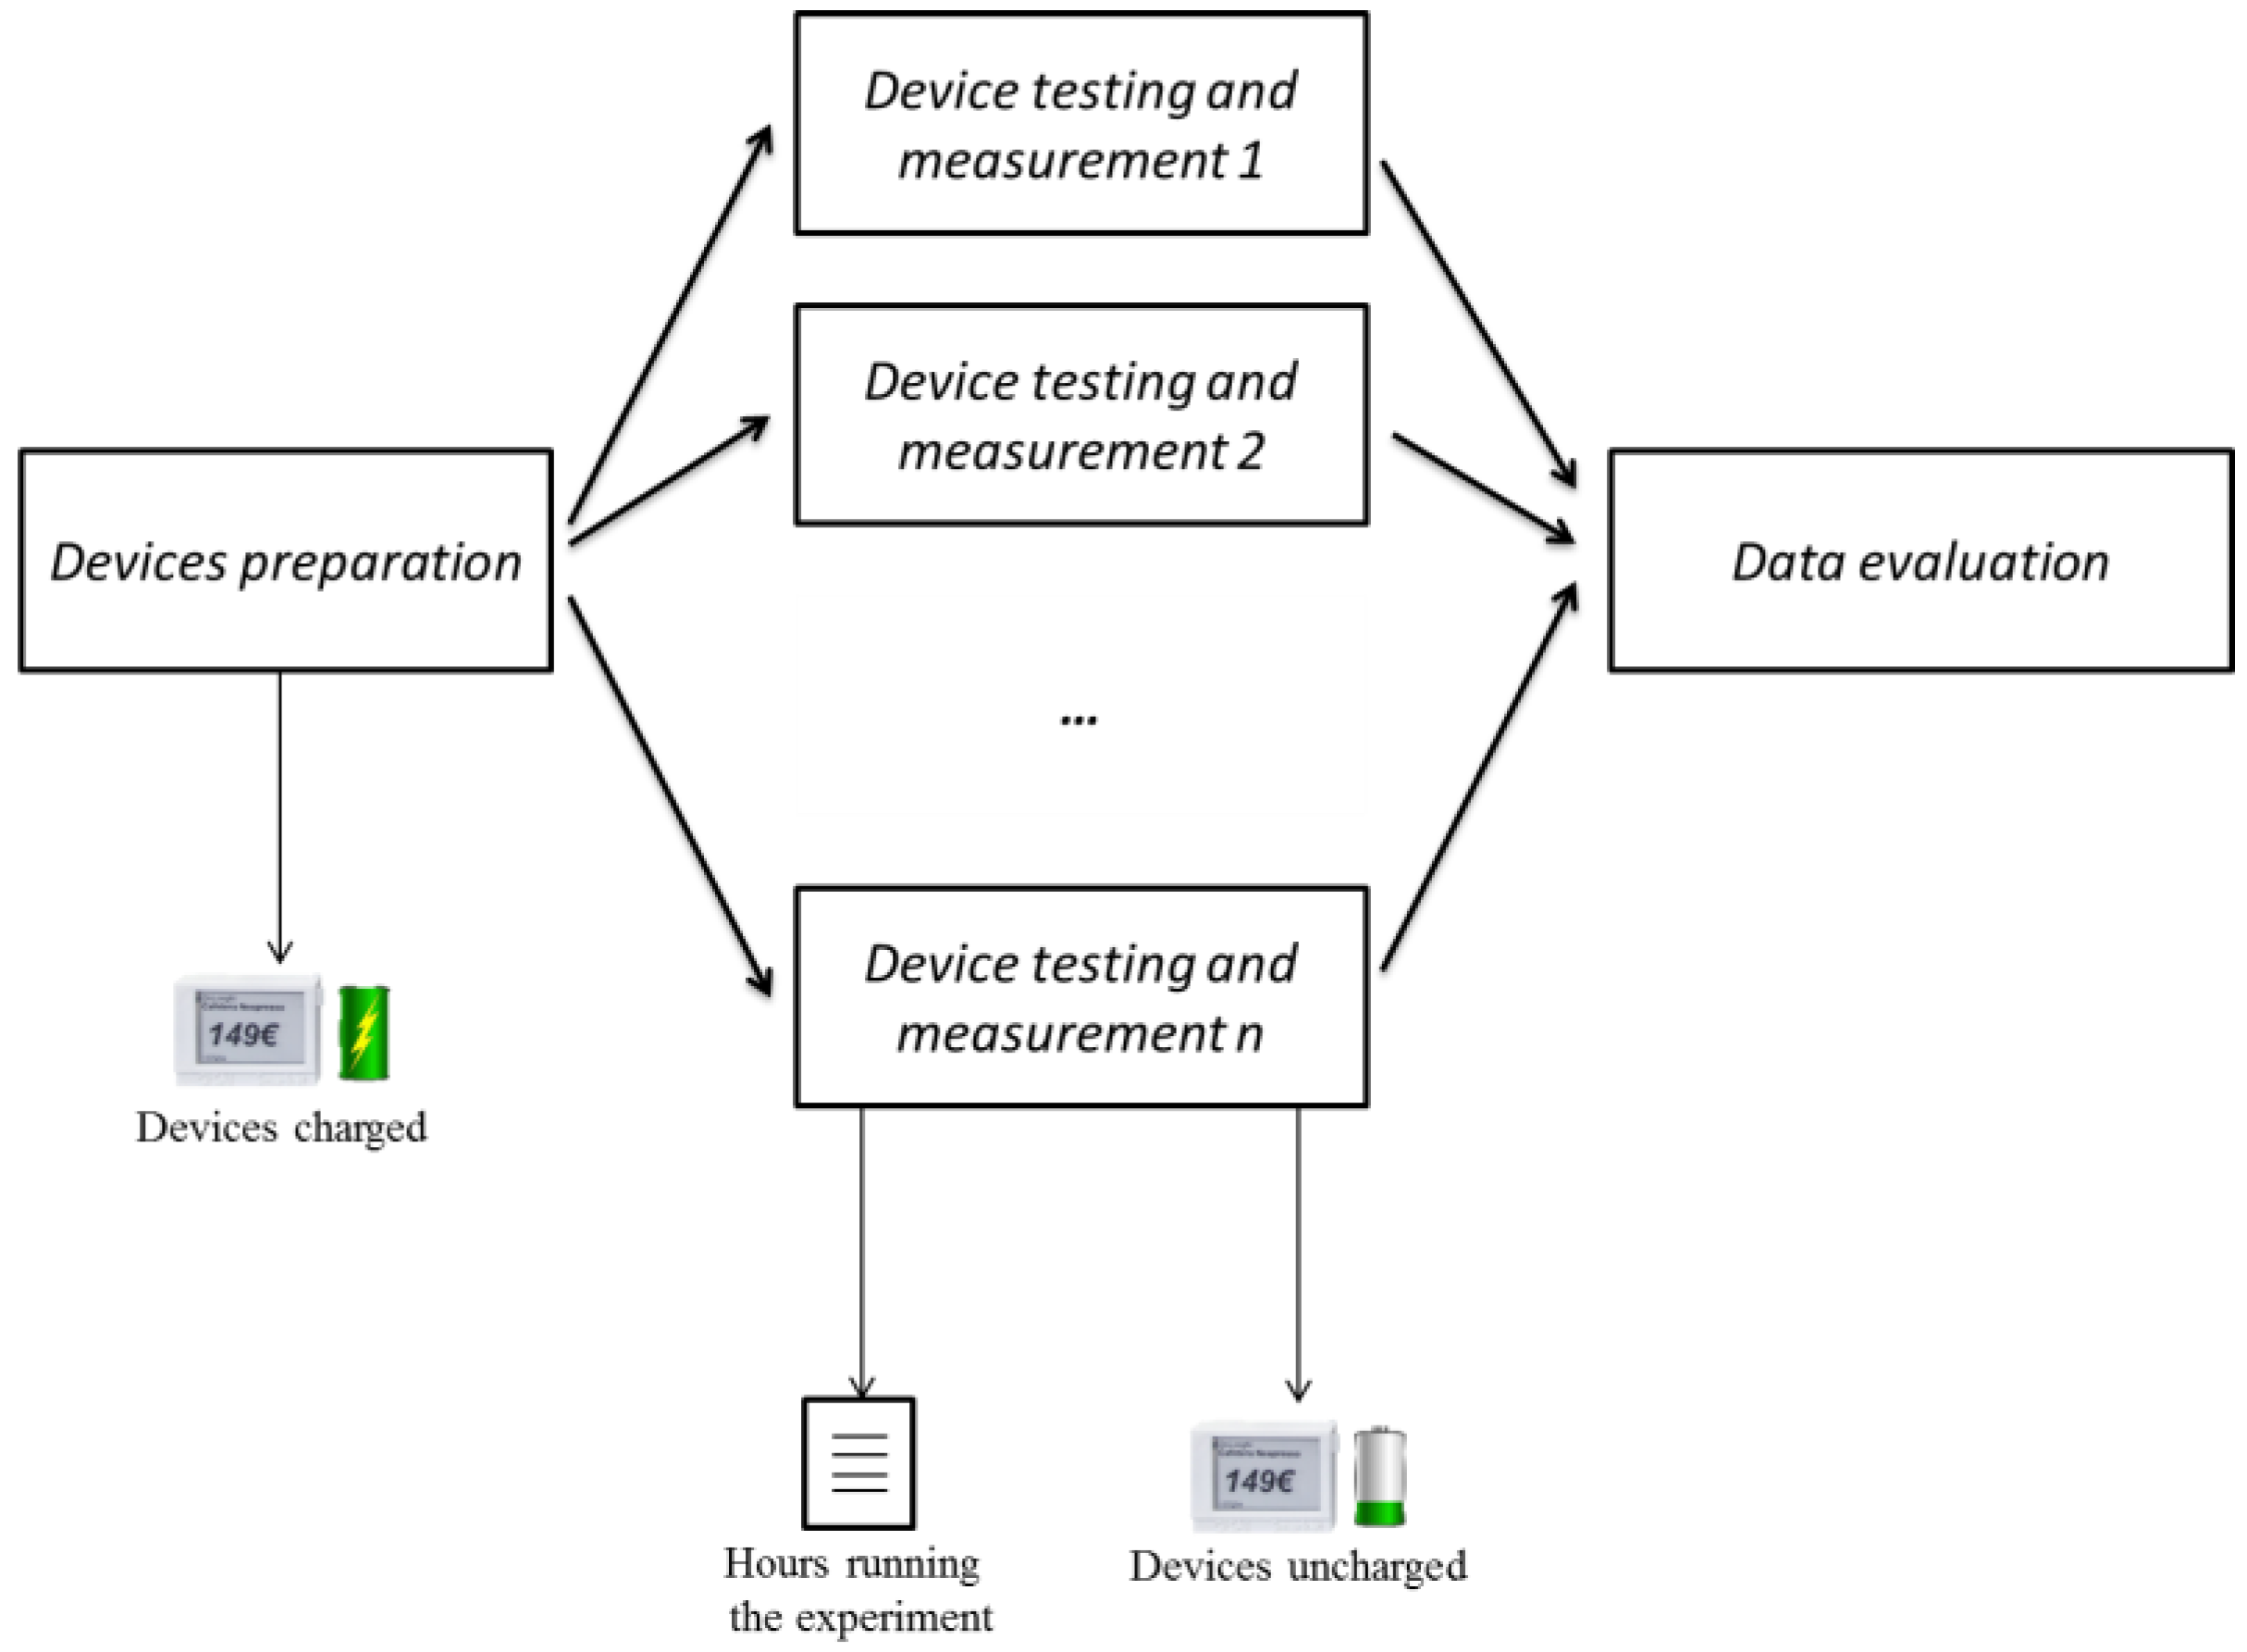 mobility service engine (mse) mrn nema 6-30 plug wiring diagram, Wiring diagram